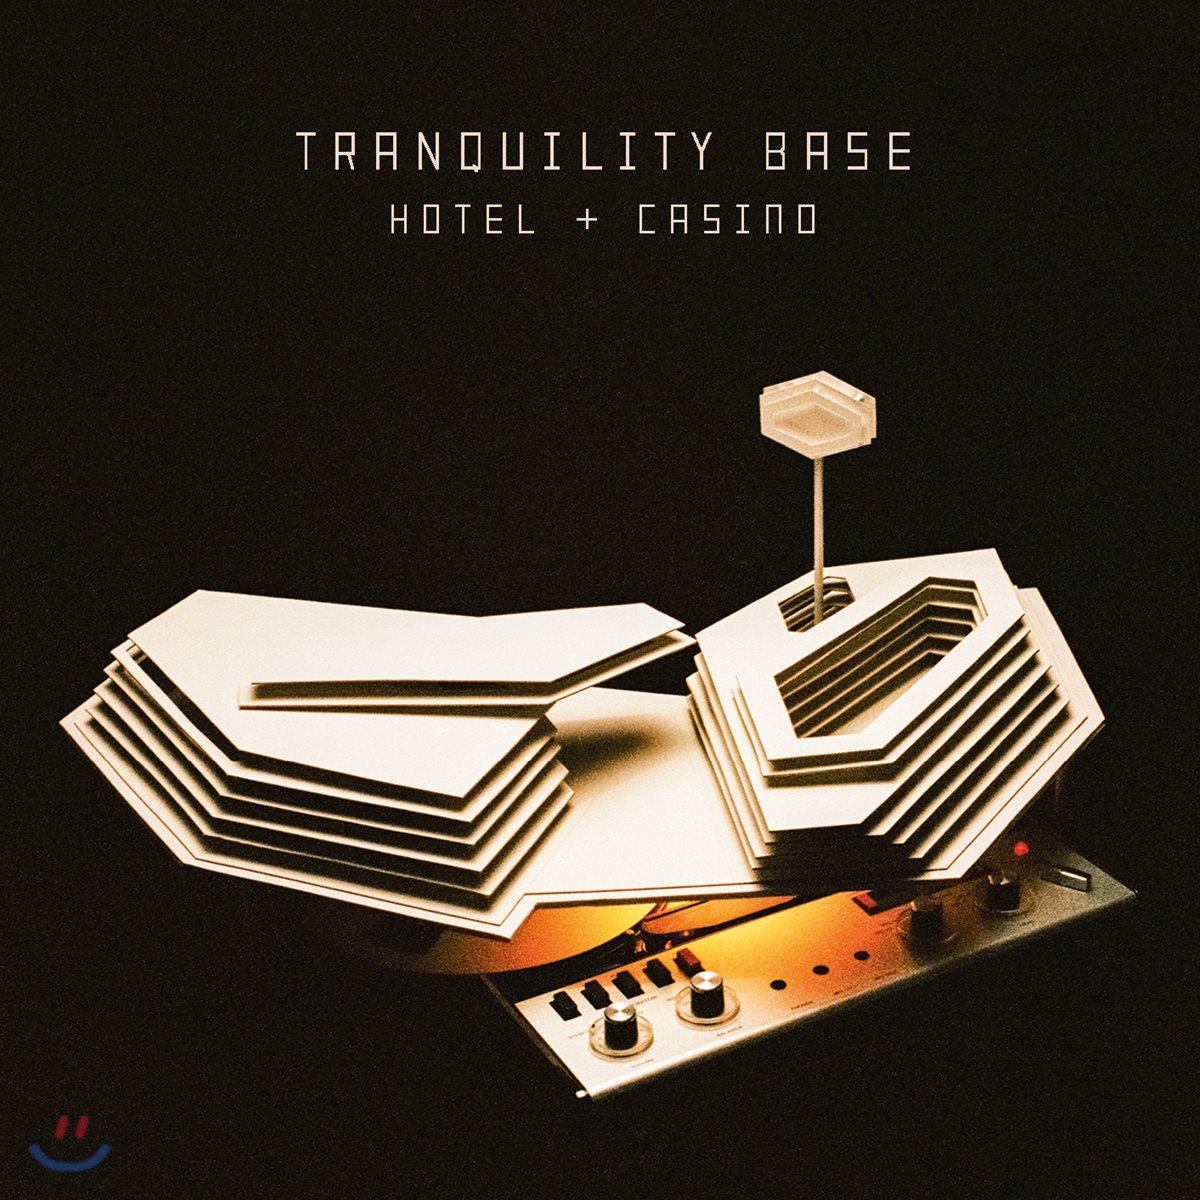 Arctic Monkeys - Tranquility Base Hotel & Casino 악틱 몽키즈 정규 6집